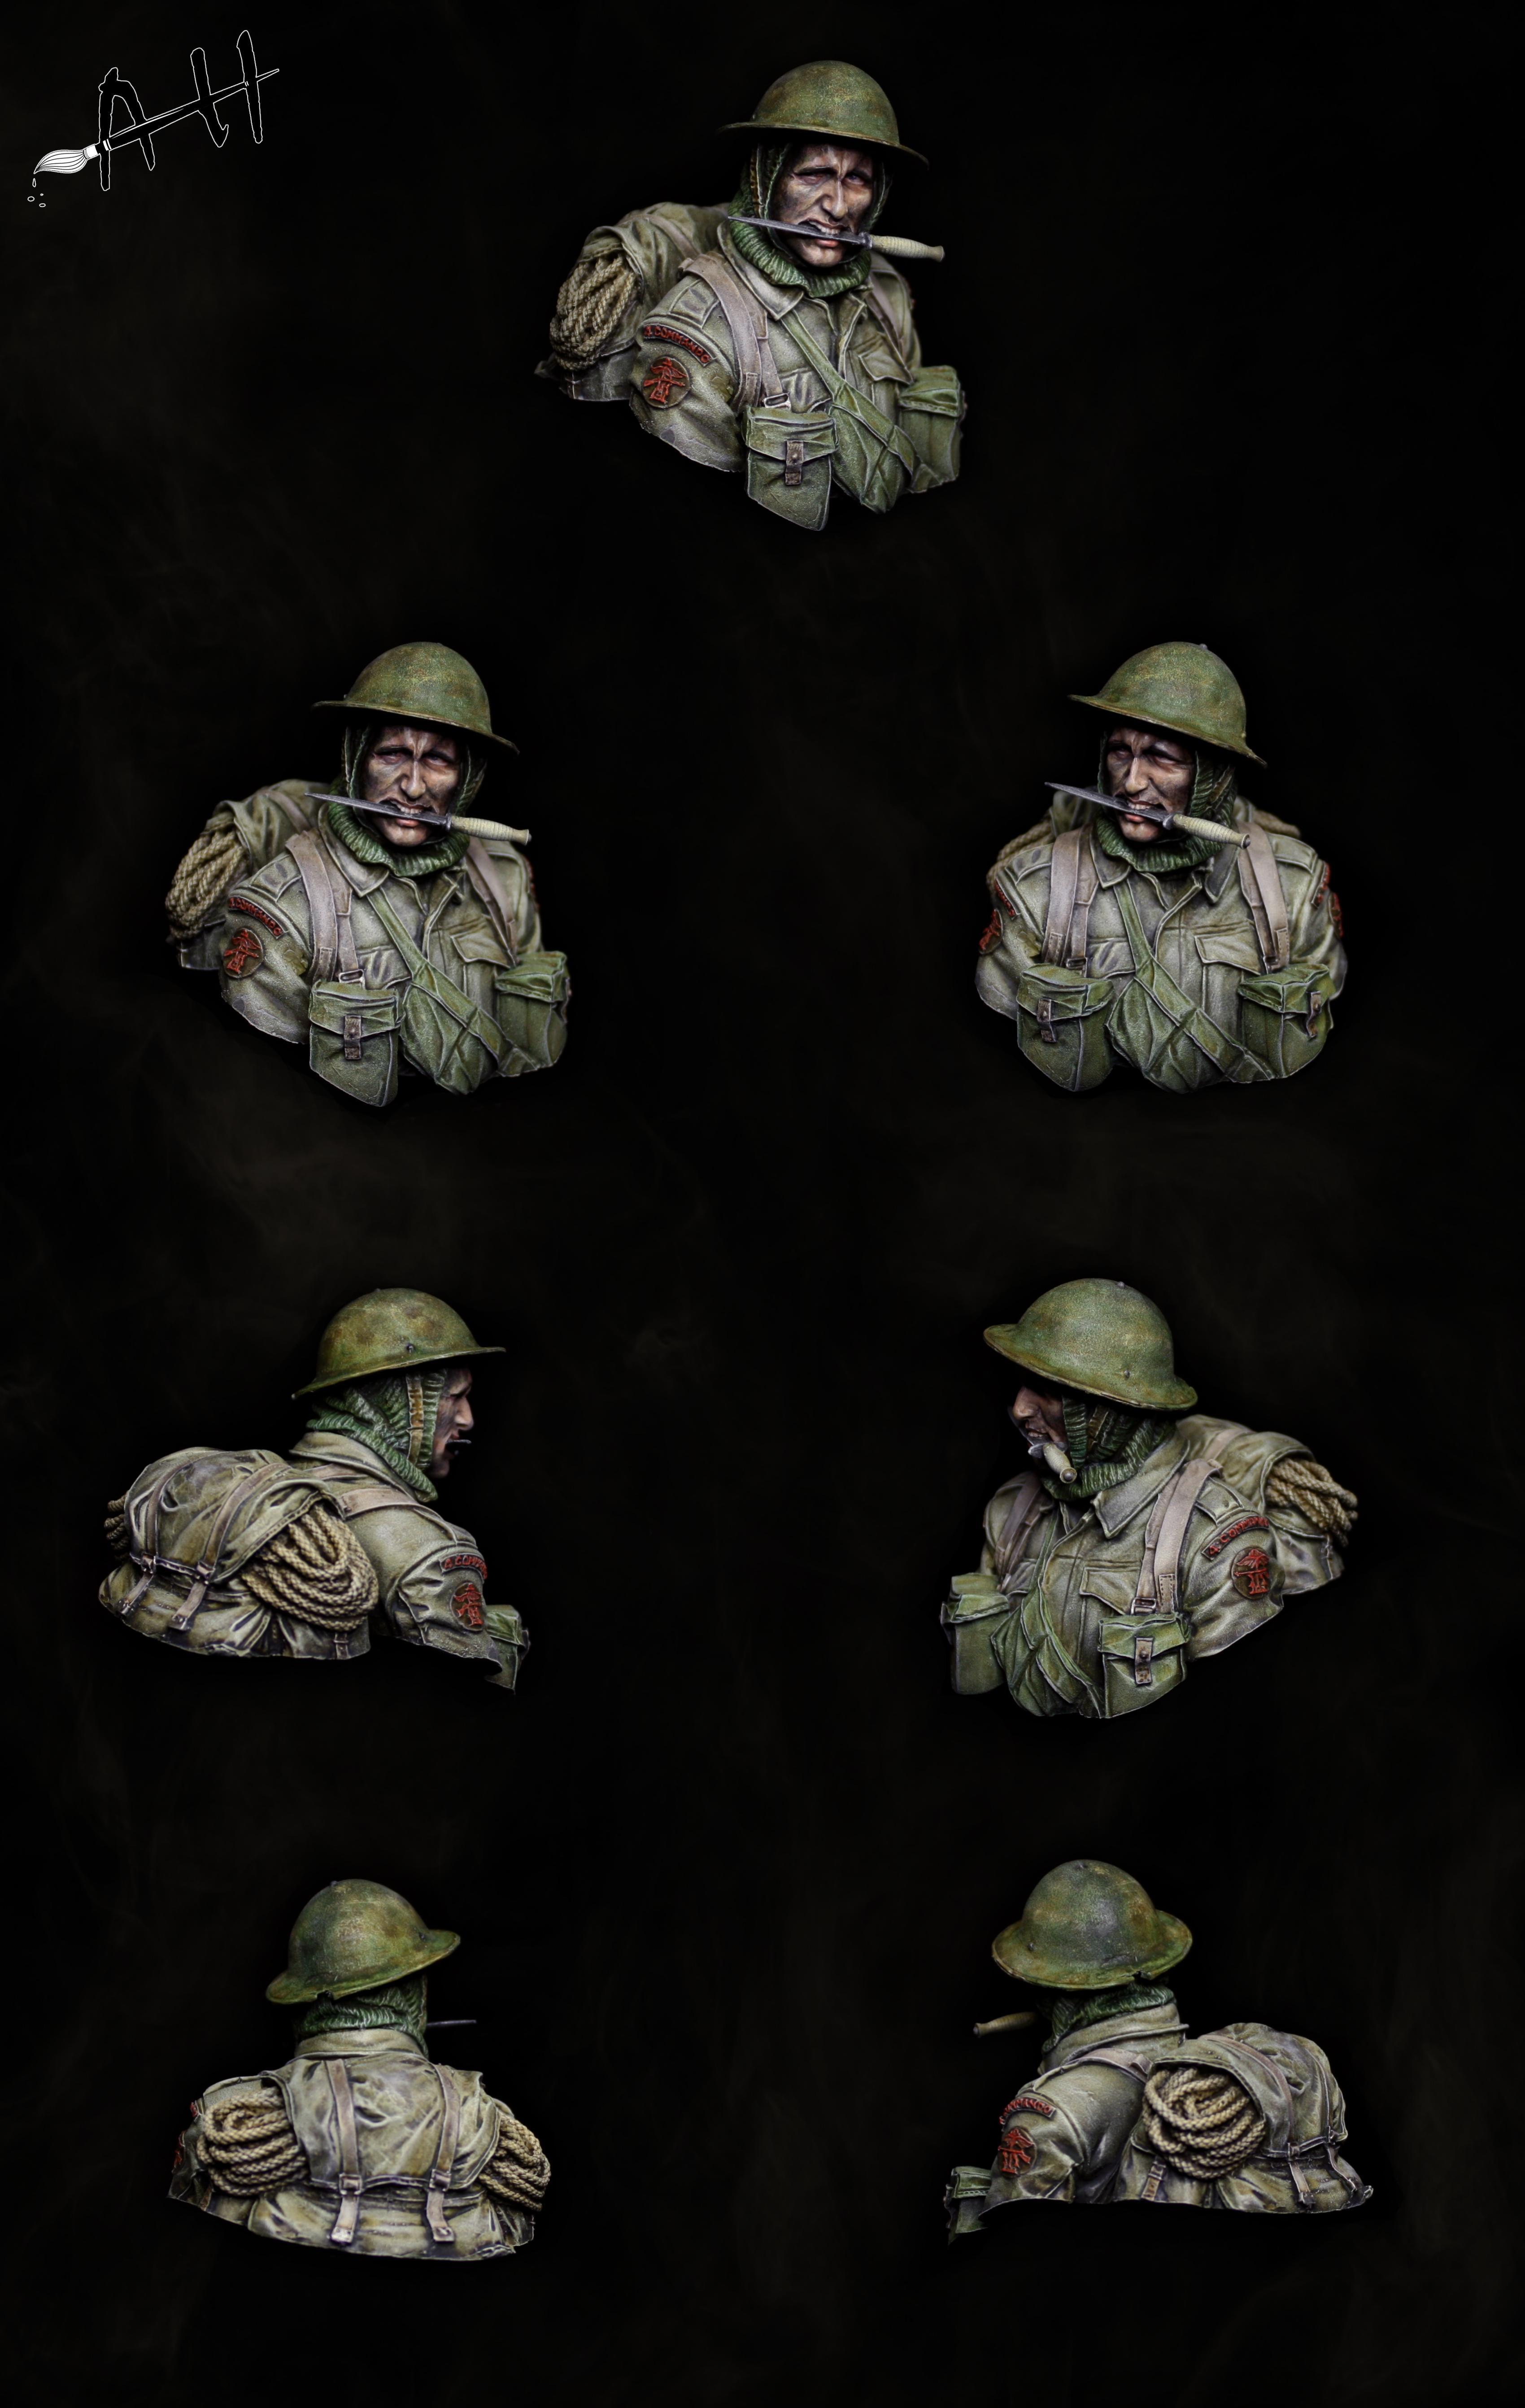 British, Bust, Commando, War, World